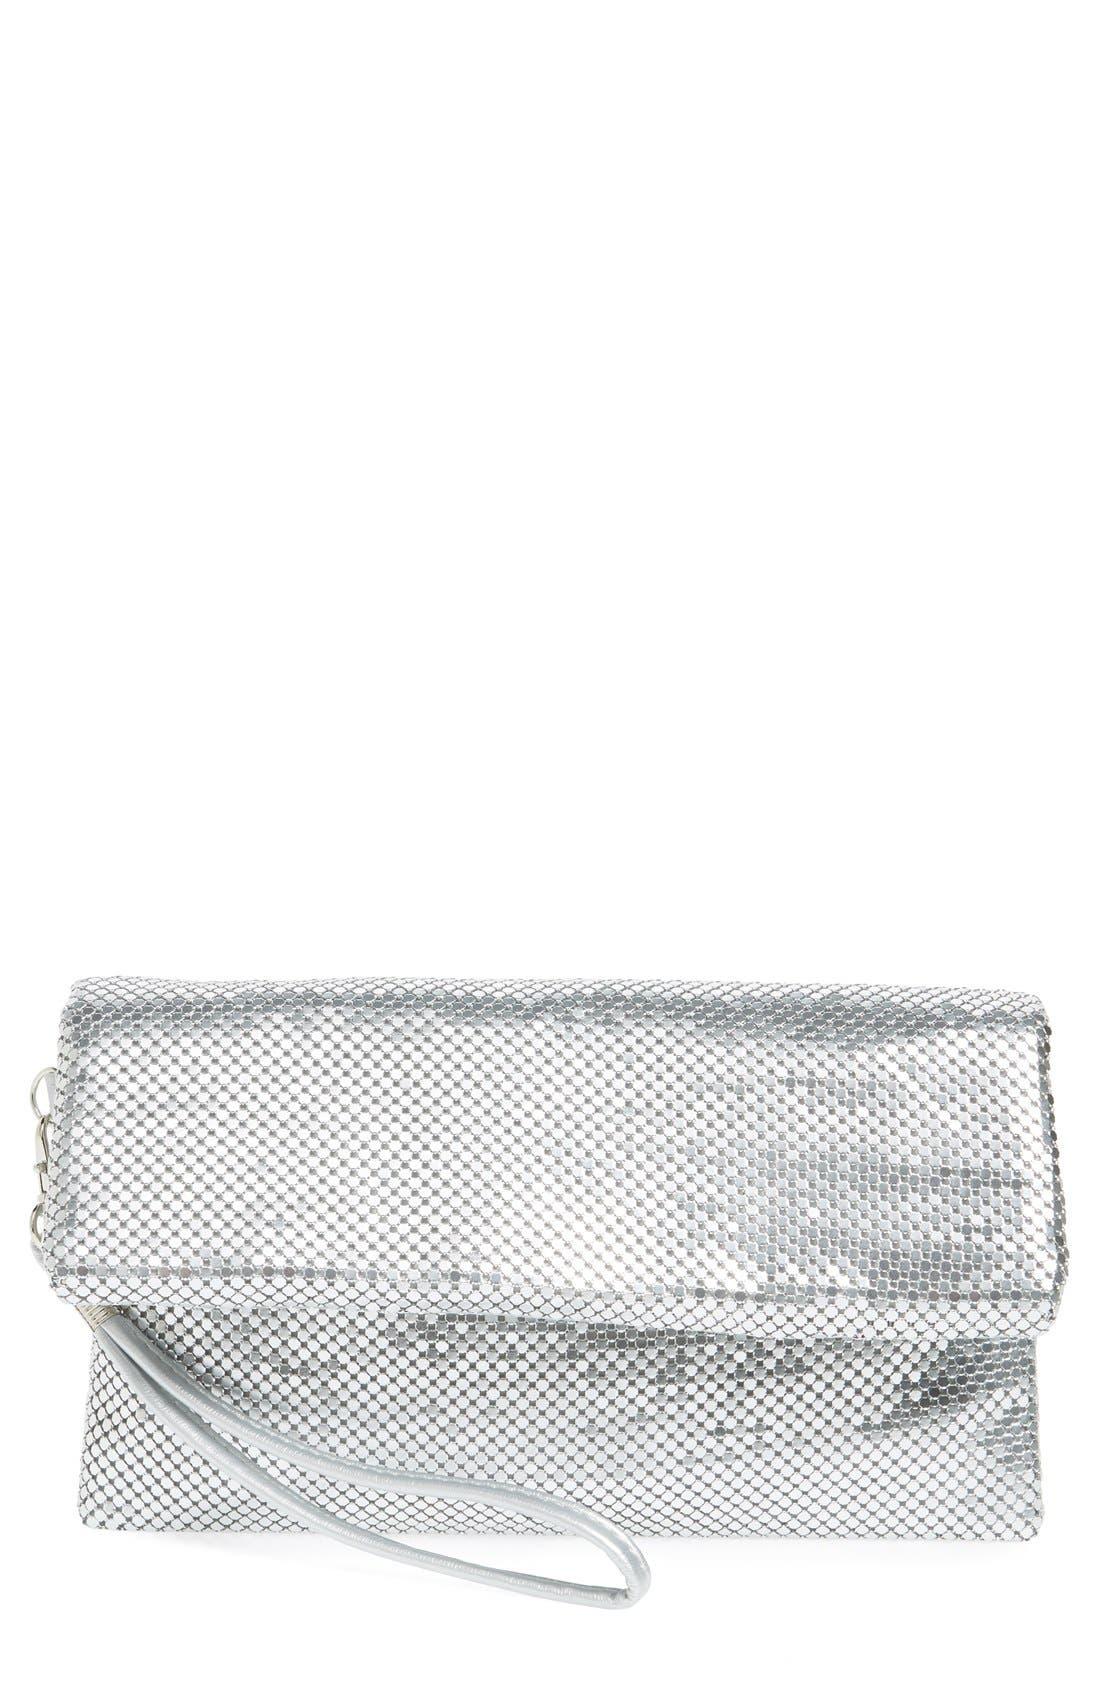 Main Image - La Regale Foldover Metal Mesh Clutch